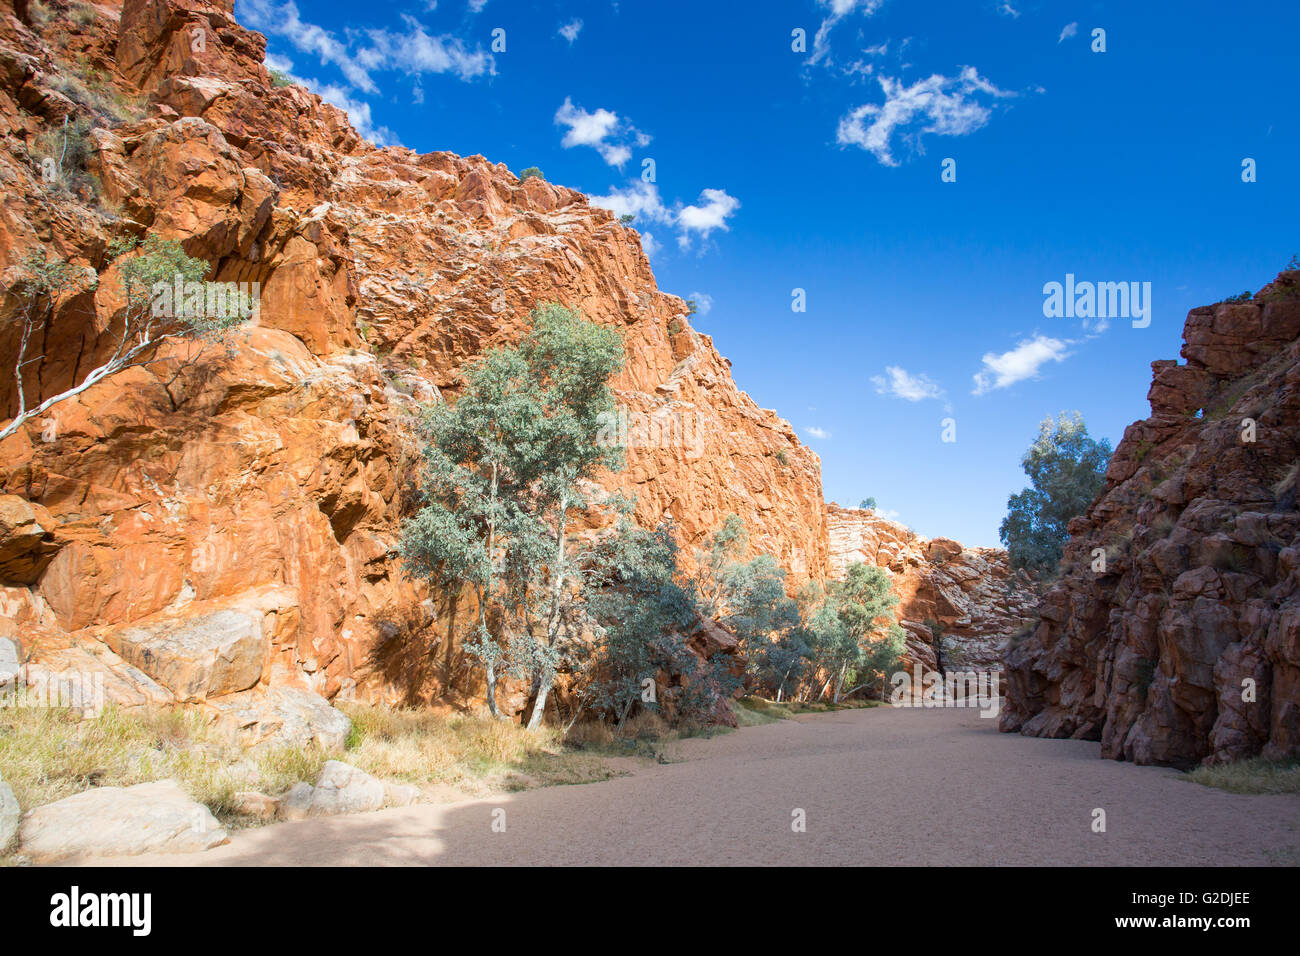 Emily Lücke Nature Reserve in der Nähe von Alice Springs, Northern Territory, Australien Stockbild